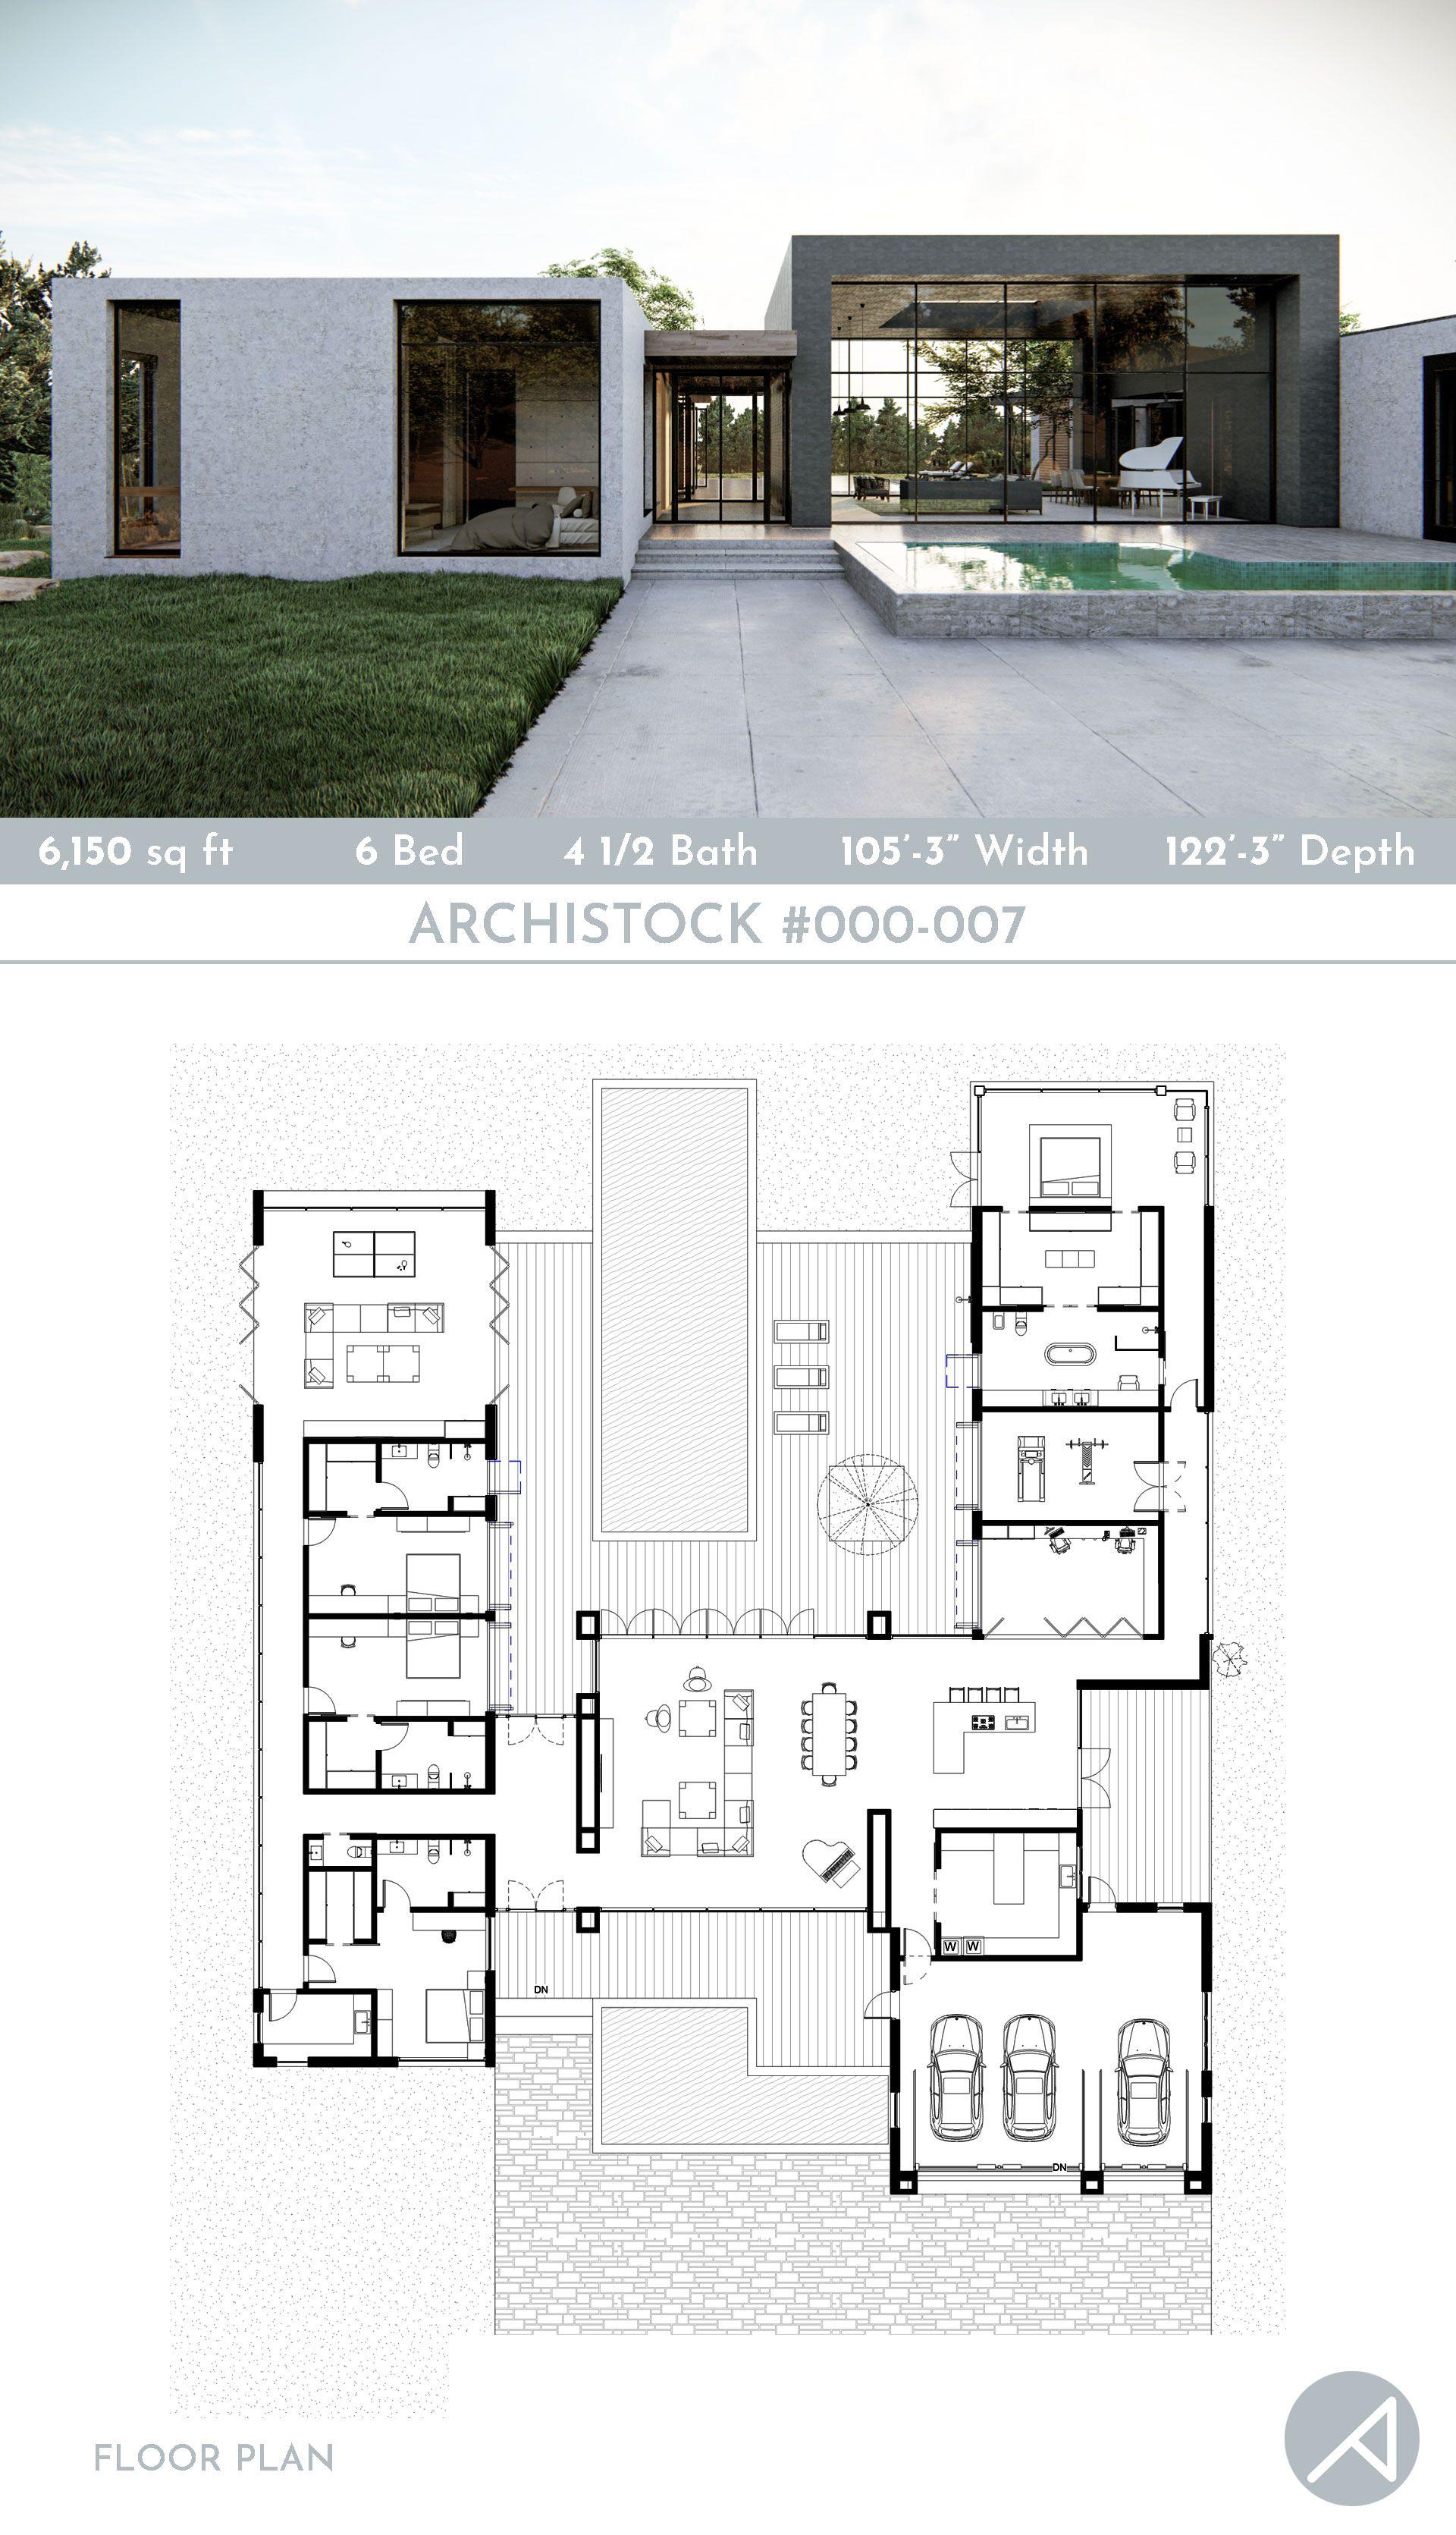 1 Story Modern Minimalist House Design In 2021 Modern House Floor Plans Modern Minimalist House Minimalist House Design